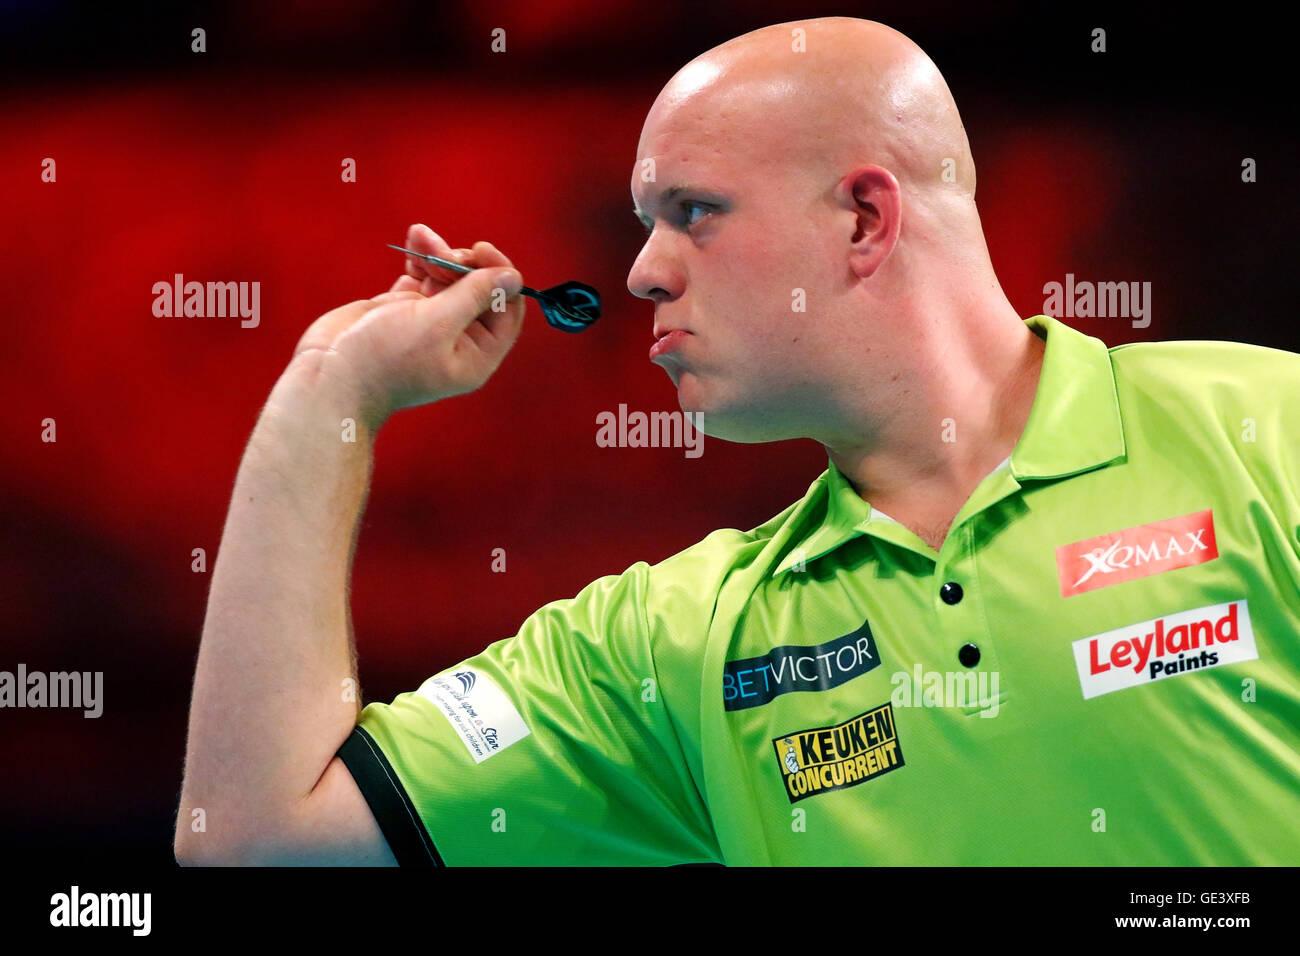 Empress Ballroom, Blackpool, Reino Unido. 23 de julio de 2016. BetVictor World Matchplay dardos. Michael van Gerwen Imagen De Stock